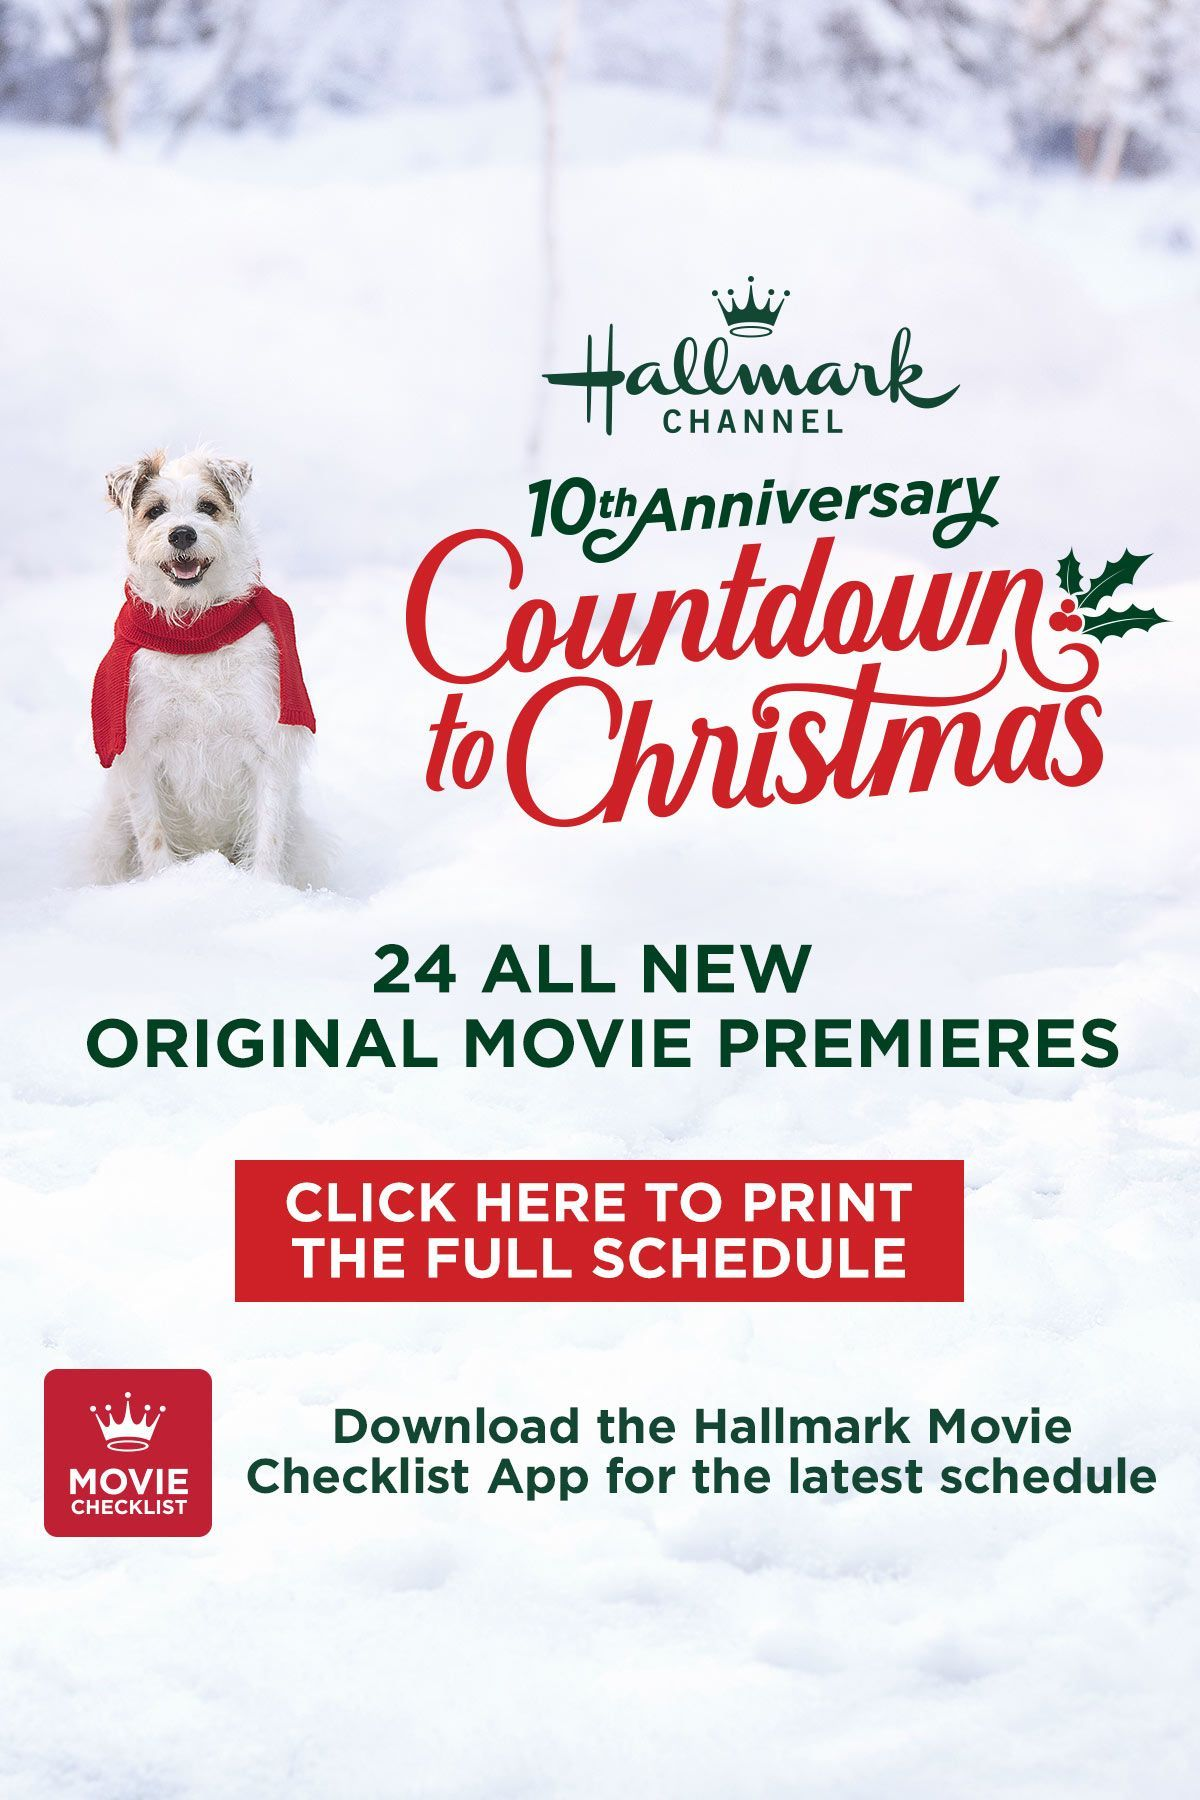 Hallmark Channel S Countdown To Christmas Celebrates Its 10th Anniversary This Seas Hallmark Channel Christmas Movies Hallmark Christmas Movies Hallmark Movies